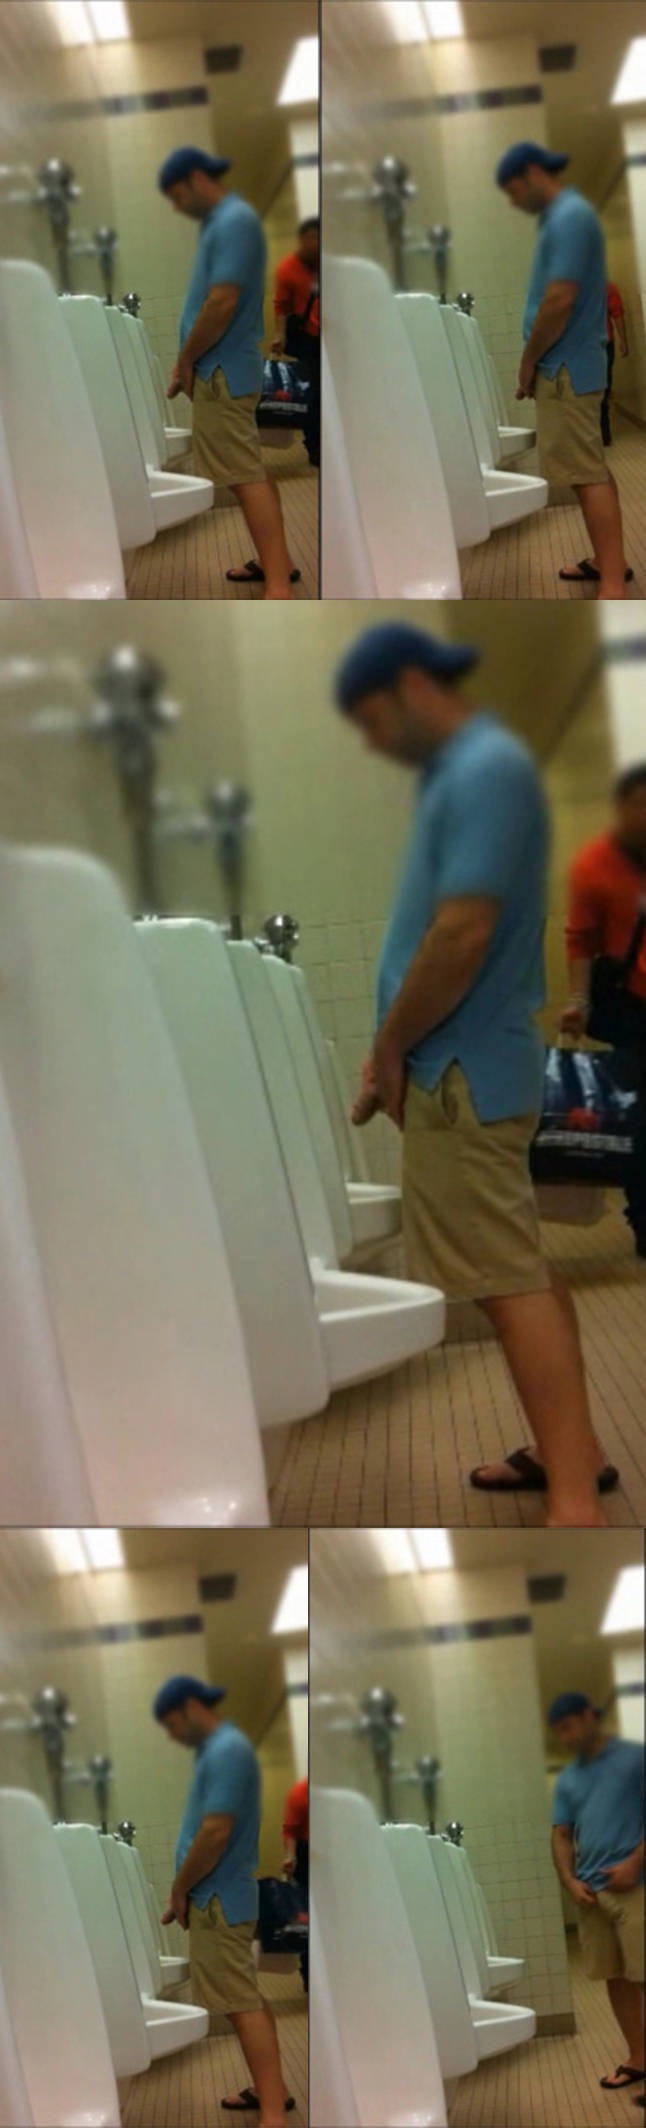 big dick at urinal